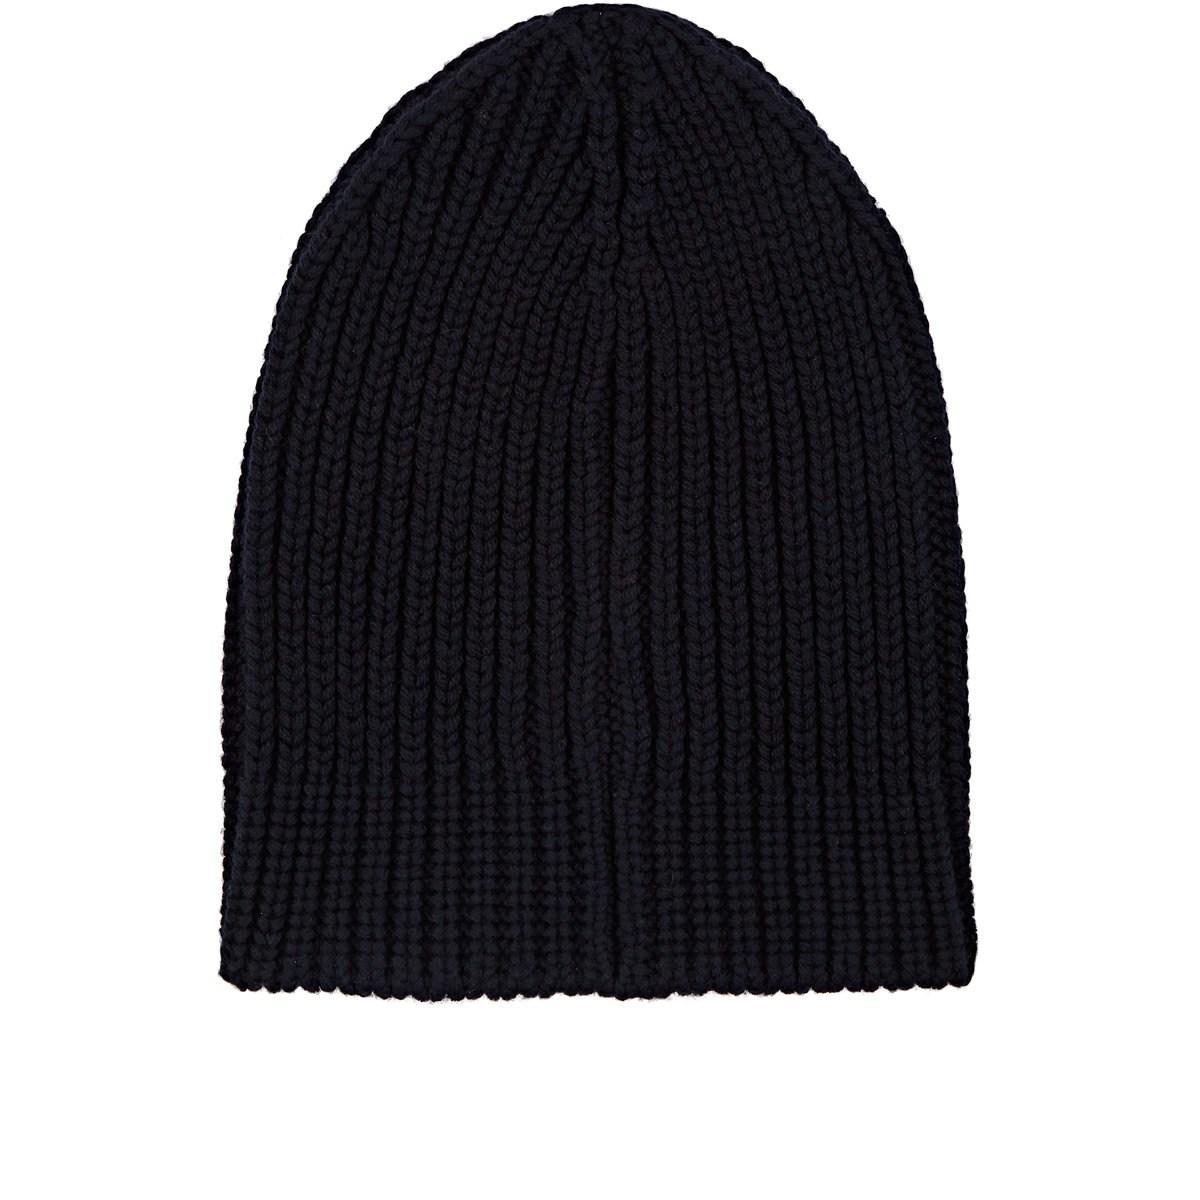 Lyst - Gucci Logo Wool Beanie in Blue for Men - Save 53% 55c16b513f7